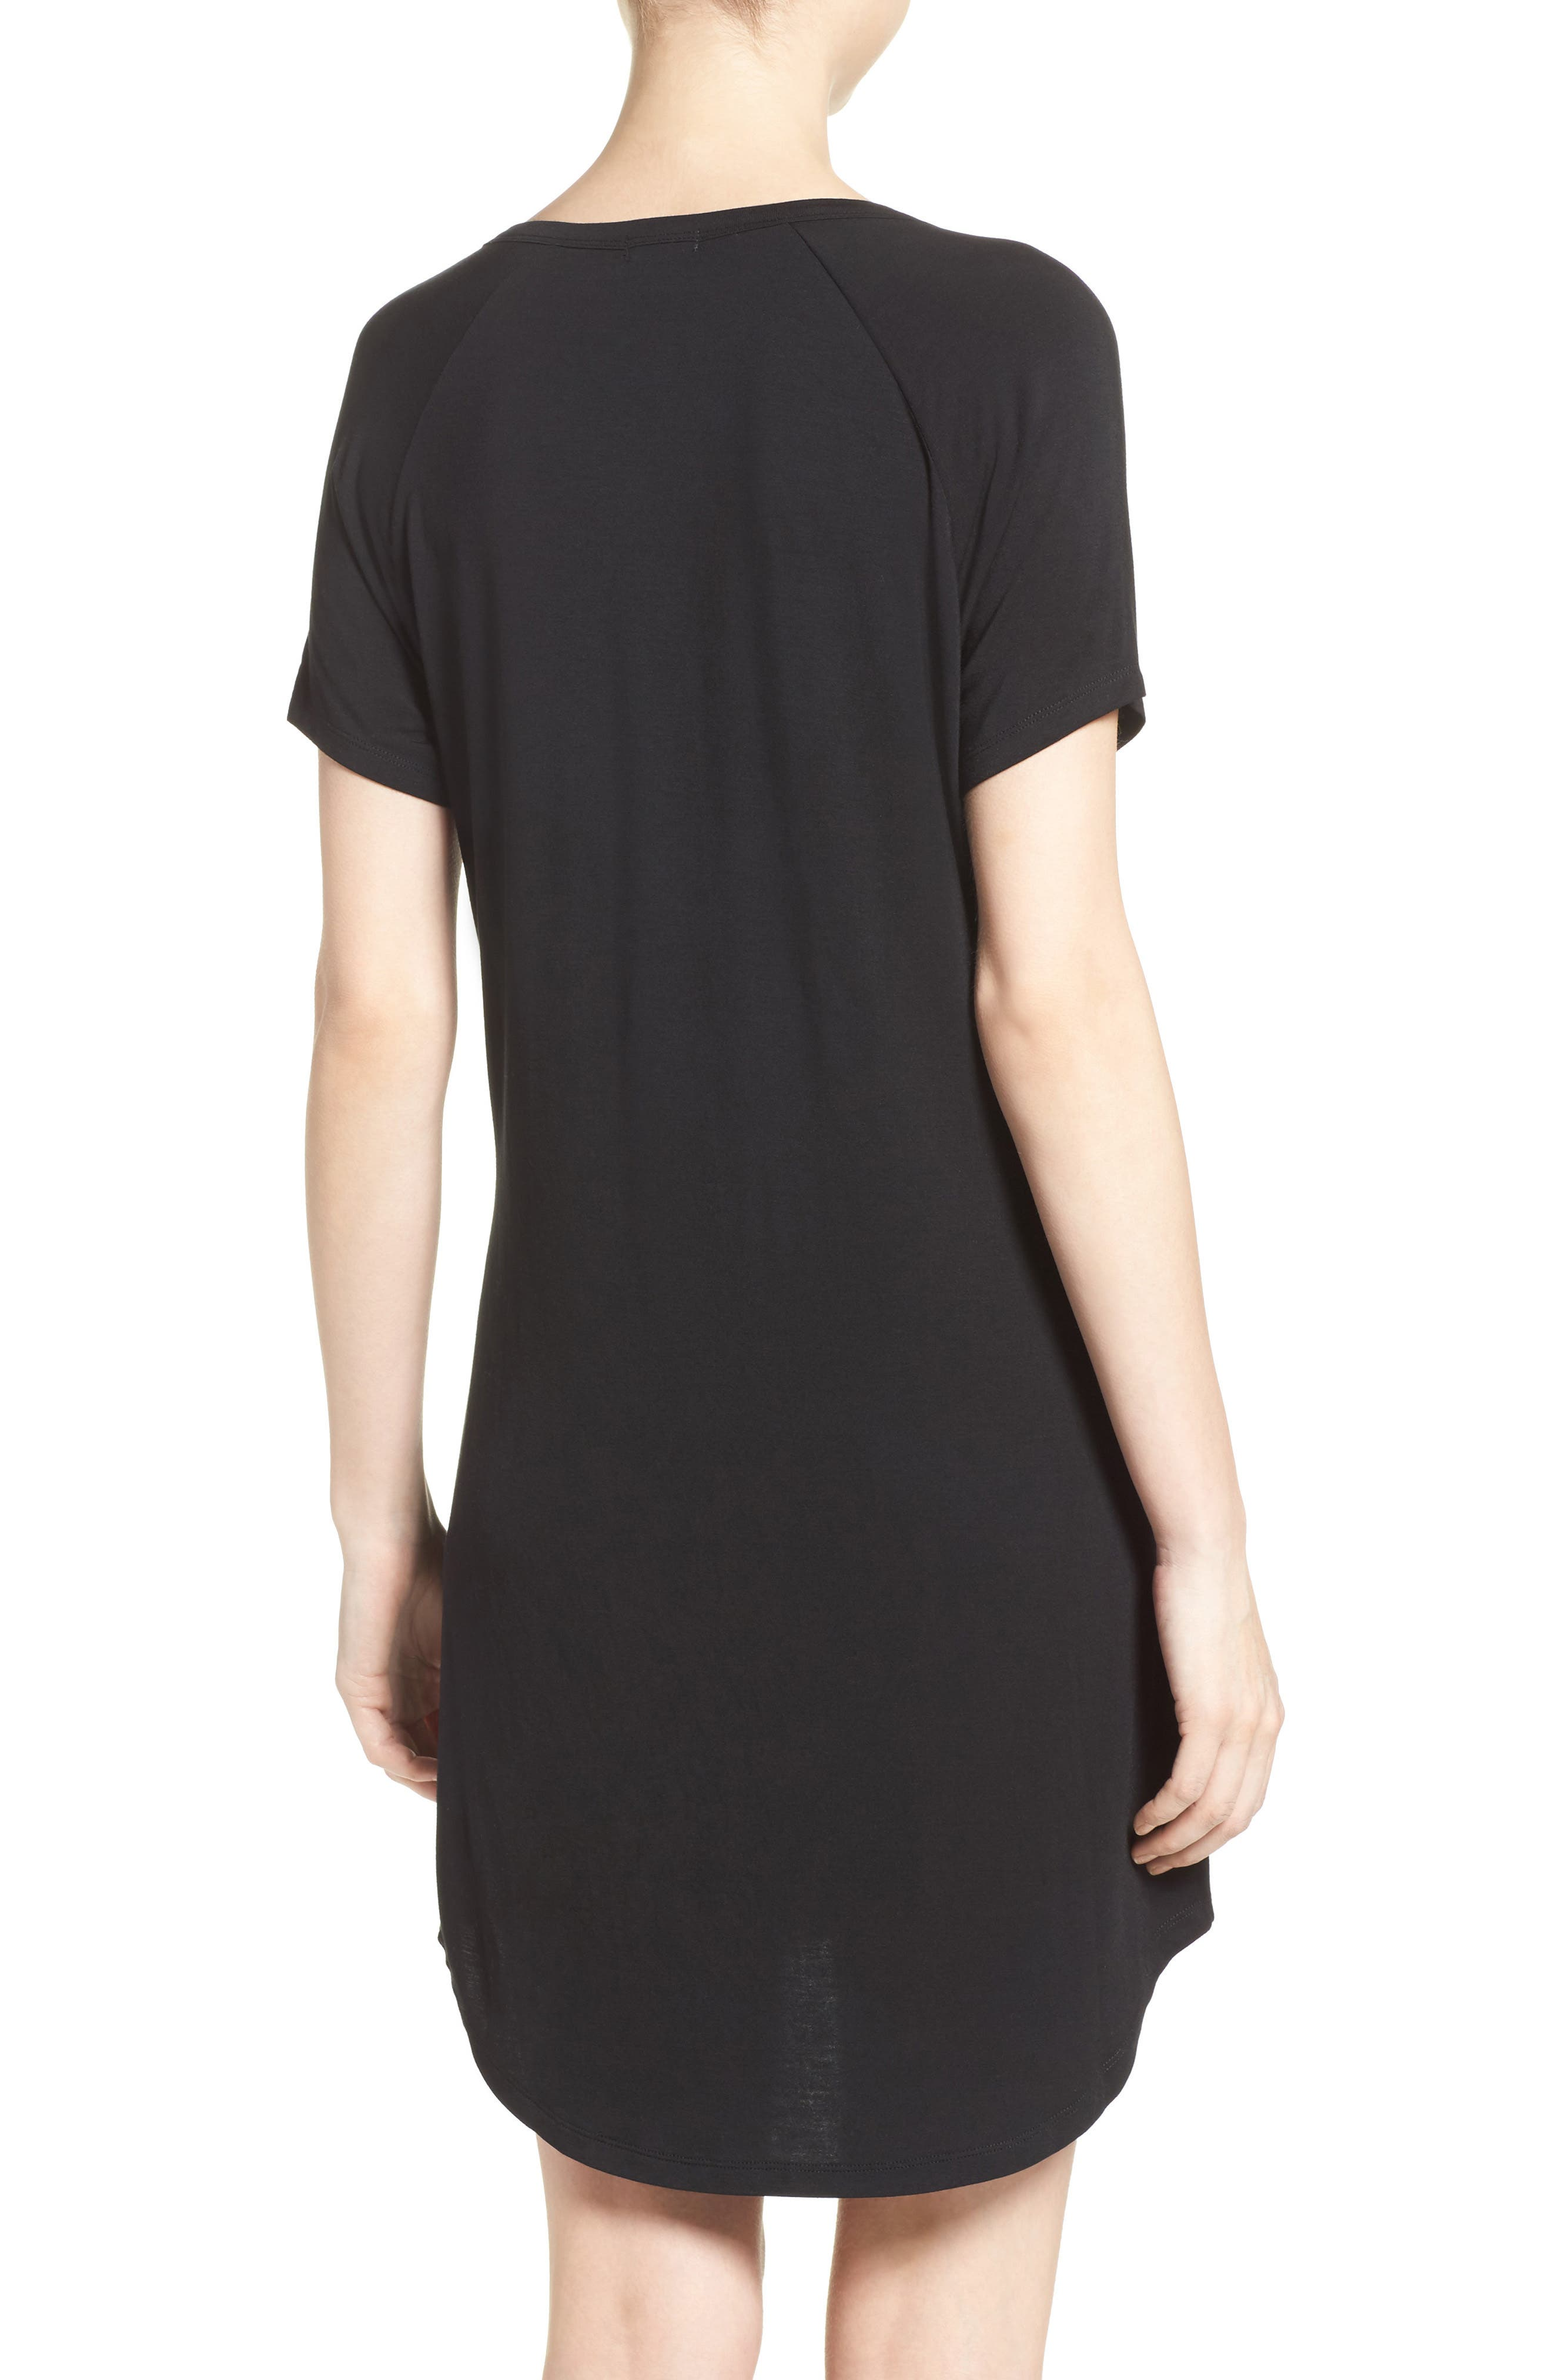 Sleep Shirt,                             Alternate thumbnail 2, color,                             BLACK